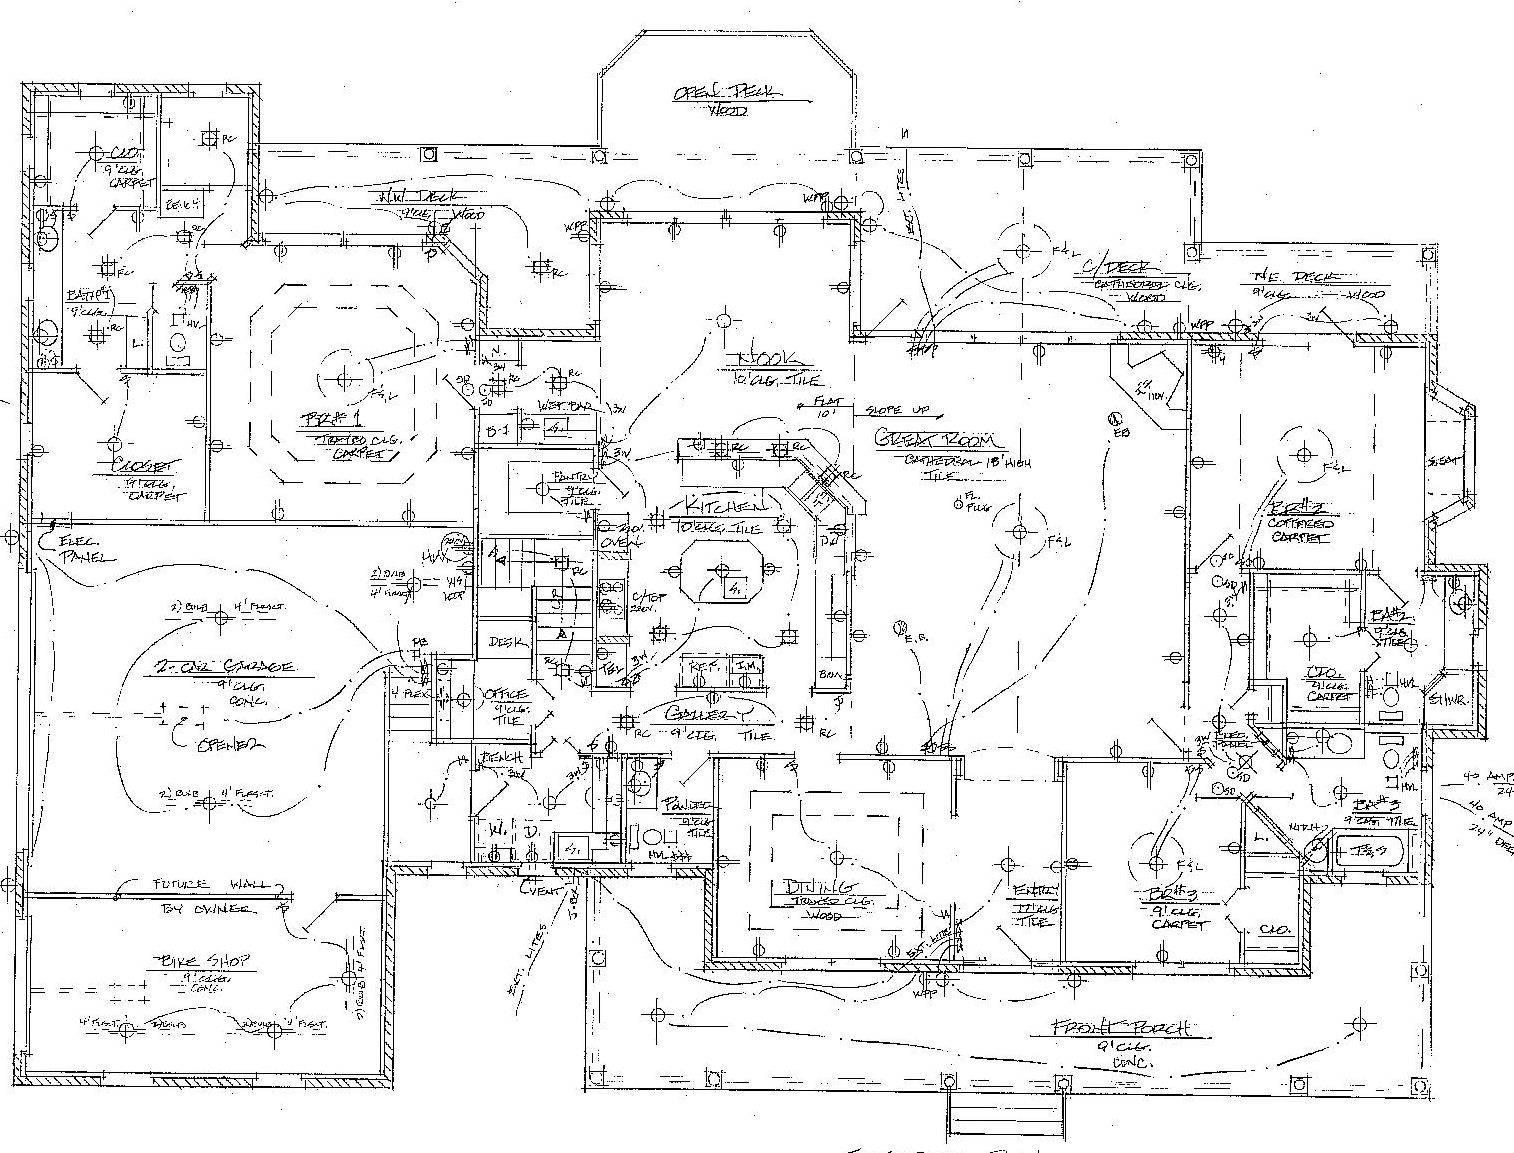 House Electrical Wiring Floor Plan Besides Restaurant